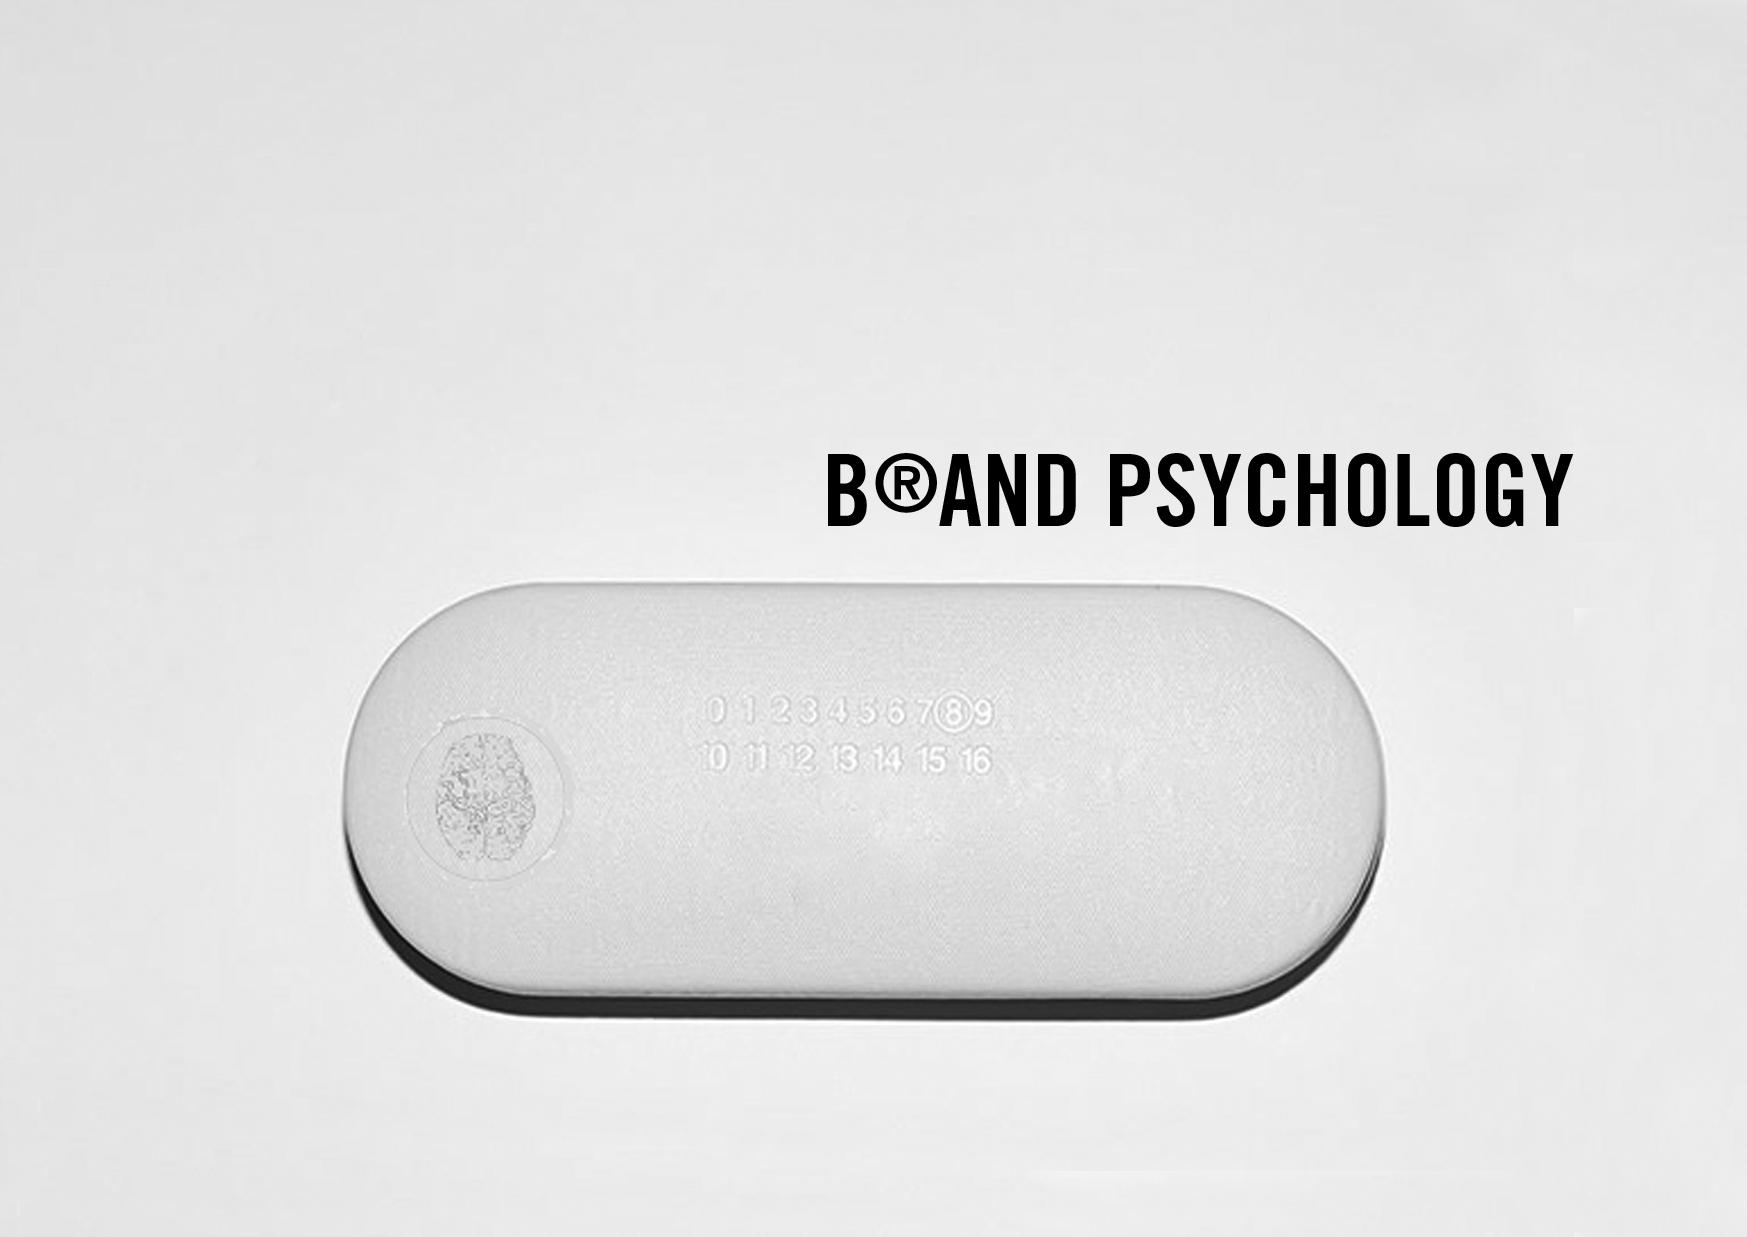 medicine brand psychology.jpg